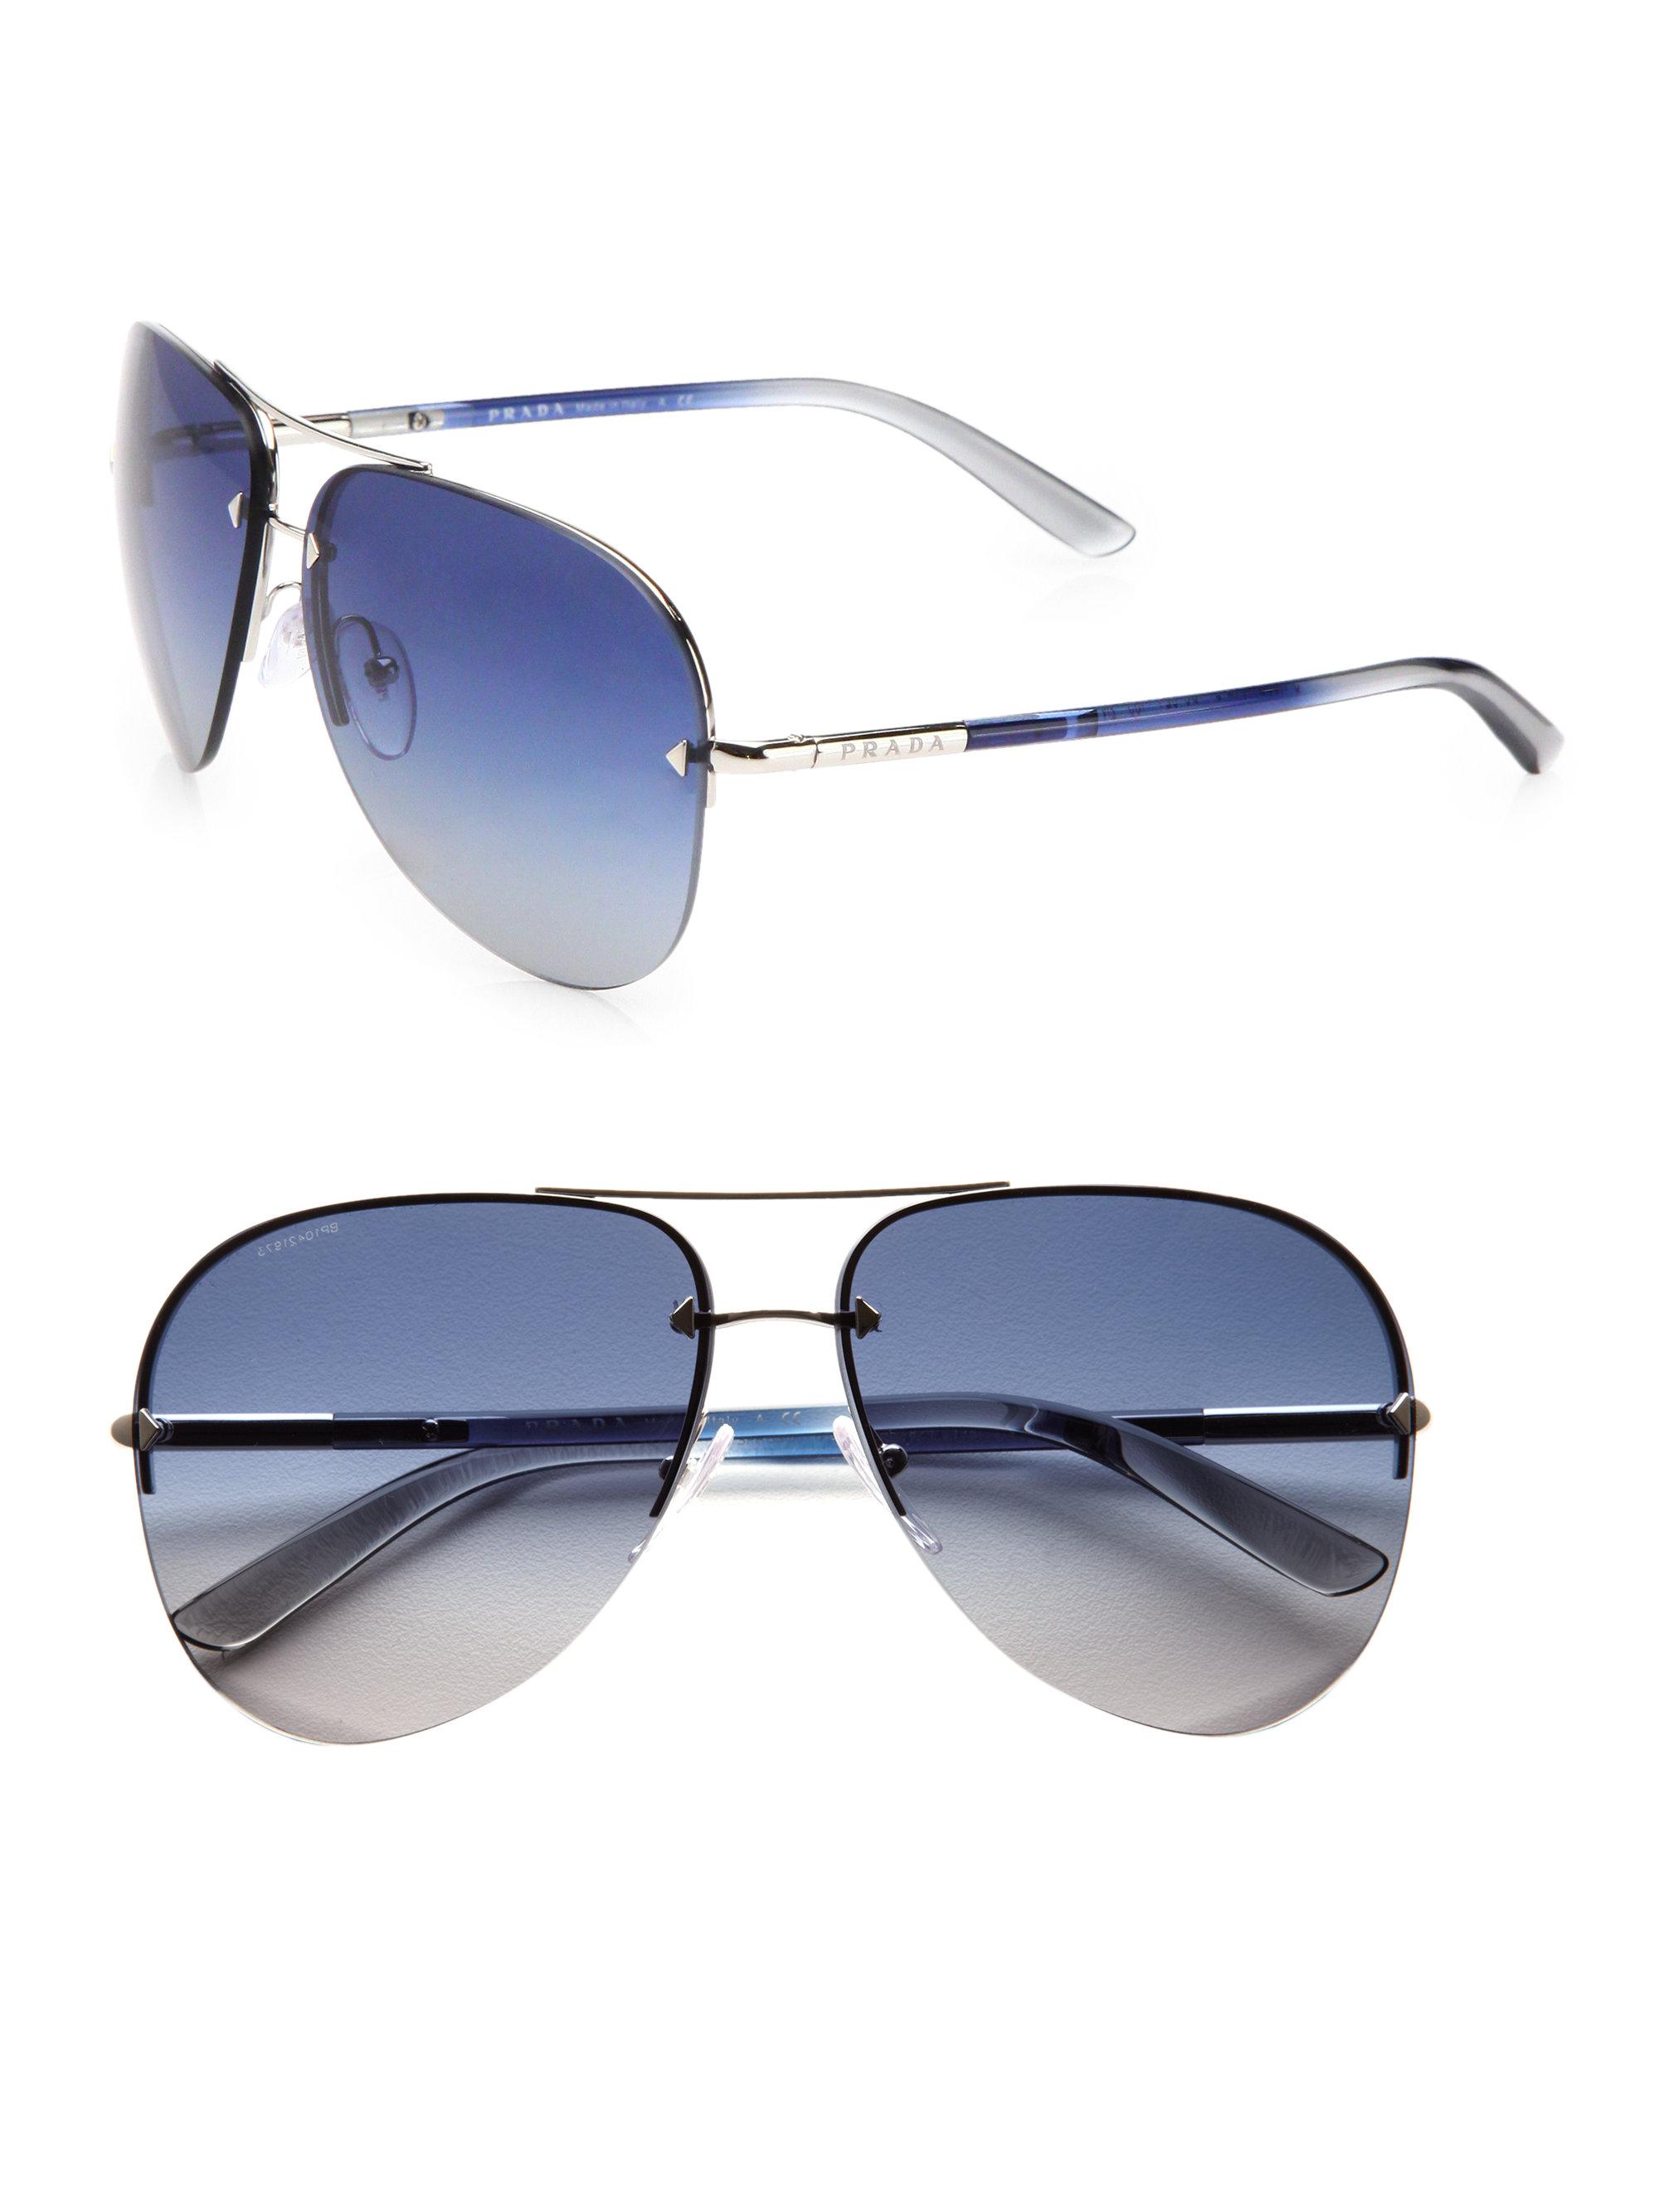 8725170cc0 Lyst - Prada Tubular Aviator Sunglasses in Metallic for Men